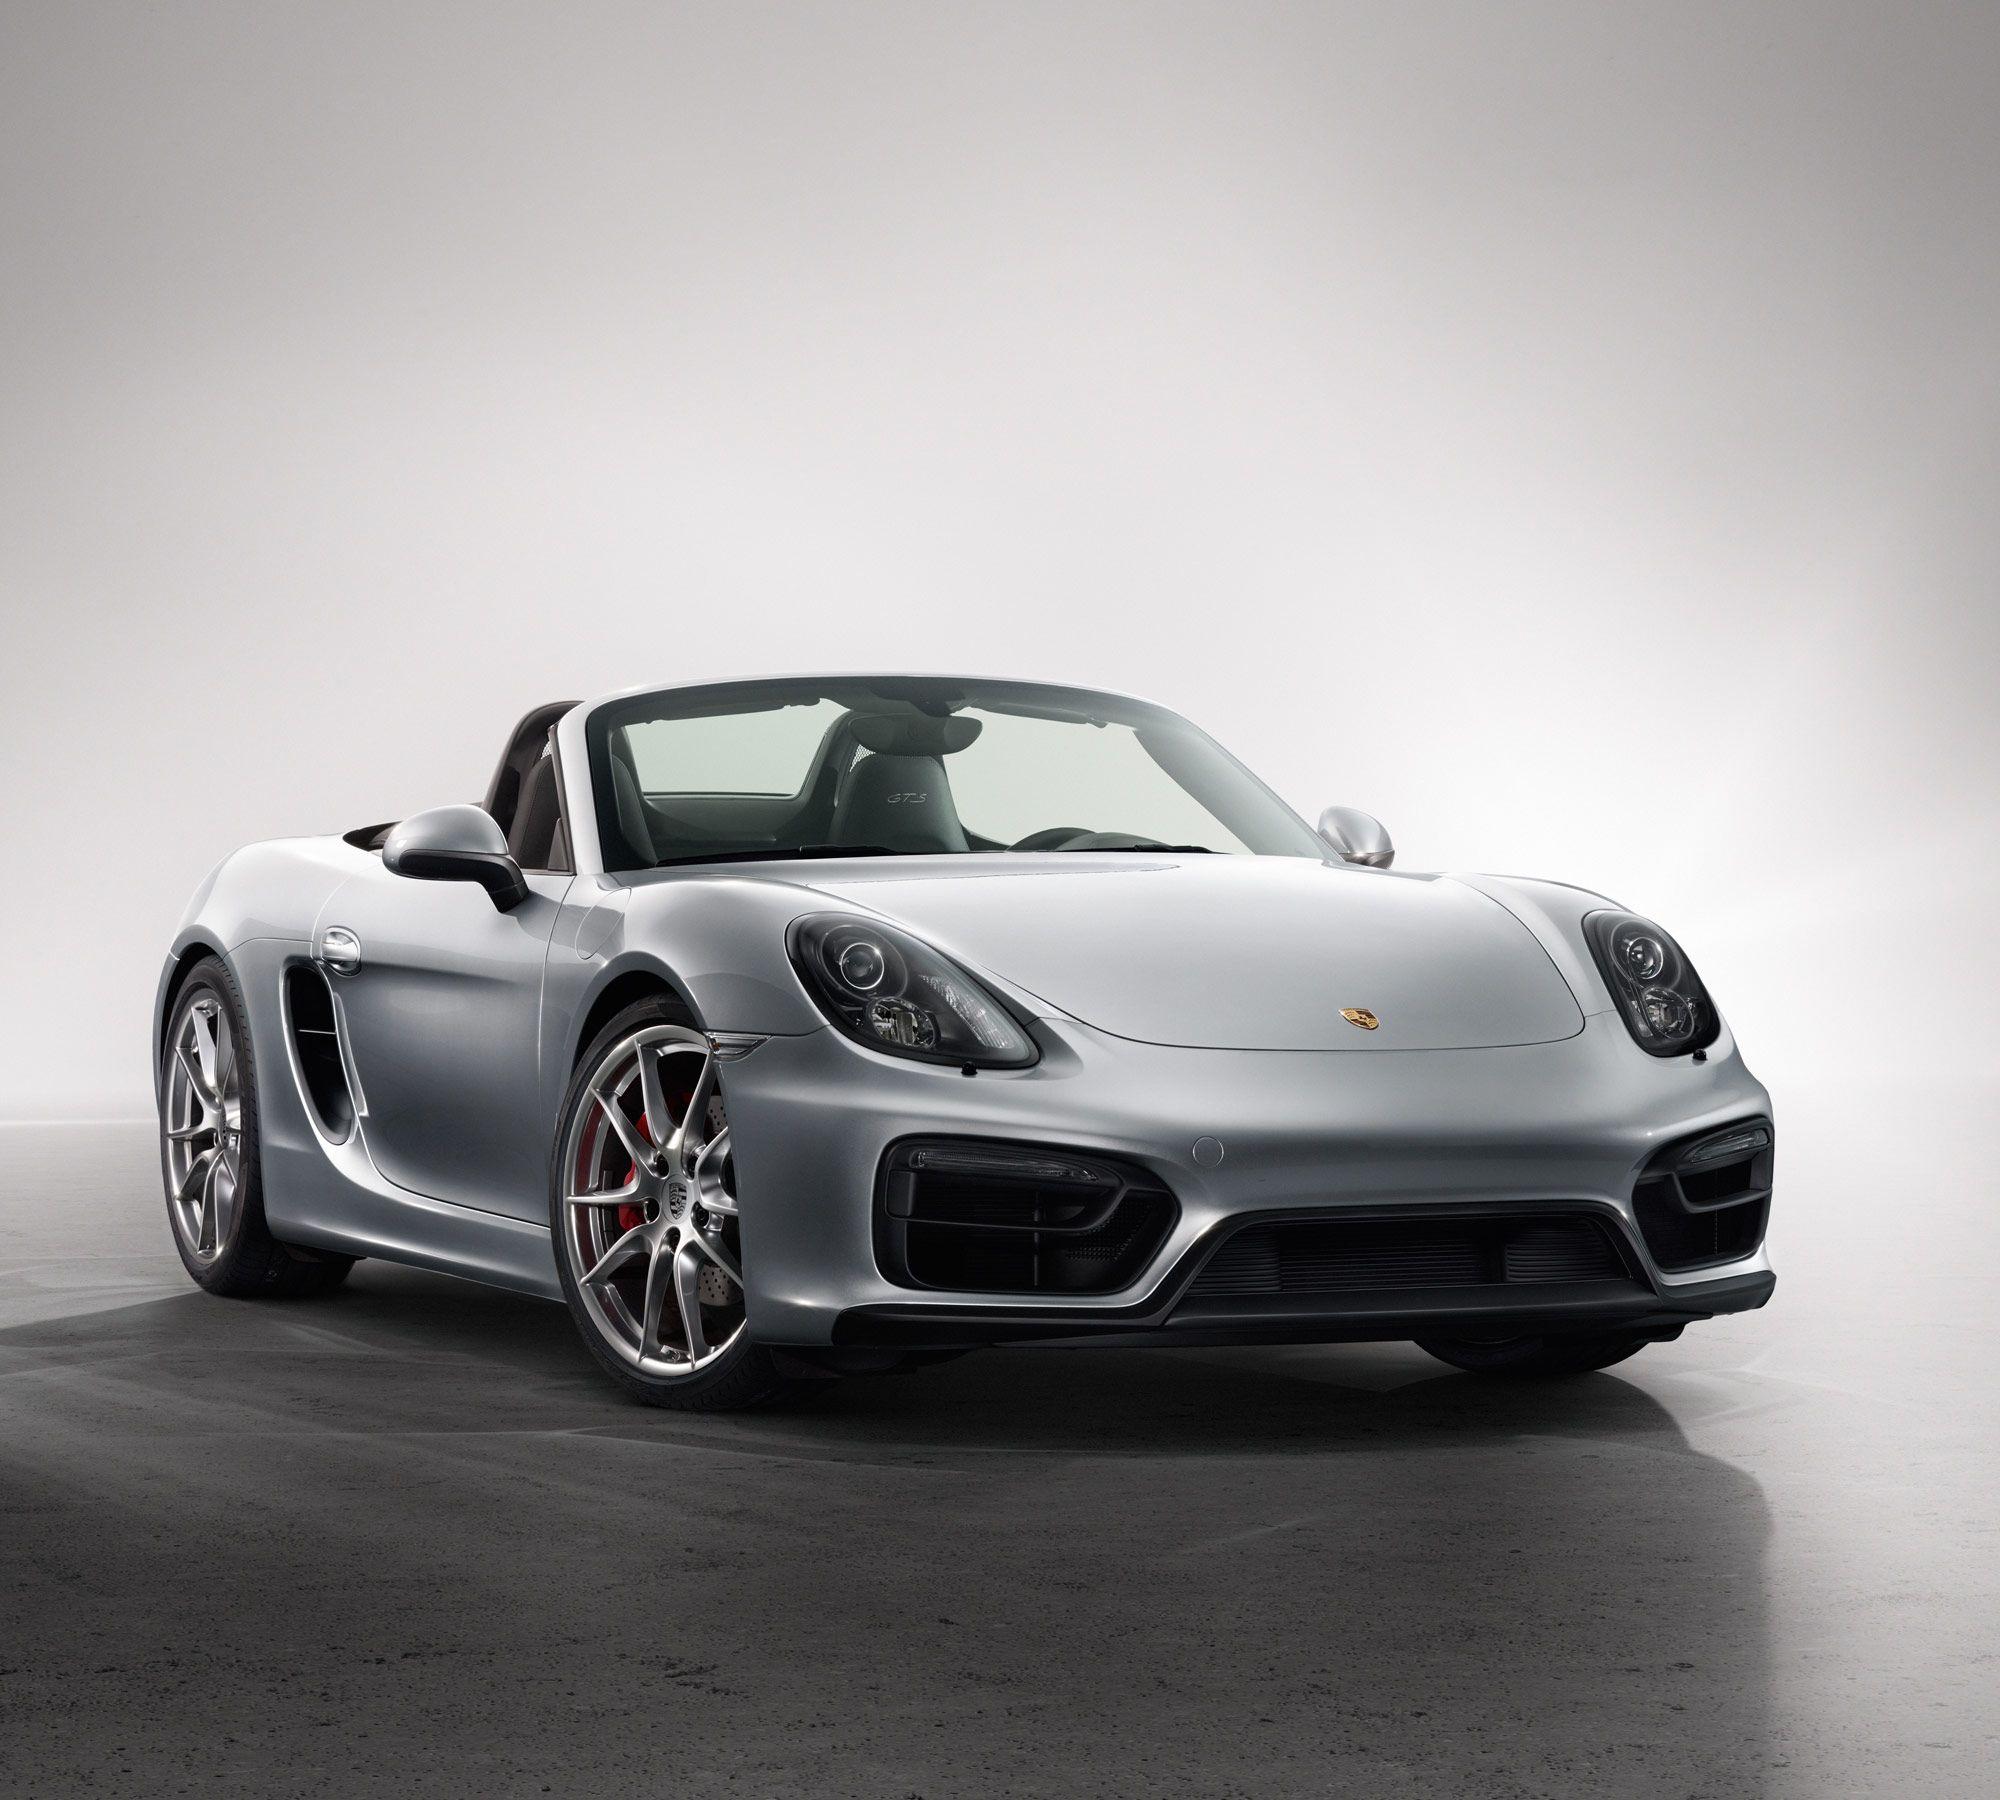 Porsche Boxster Car: New Porsche Boxster And Cayman GTS In 62 Photos, Plus U.S